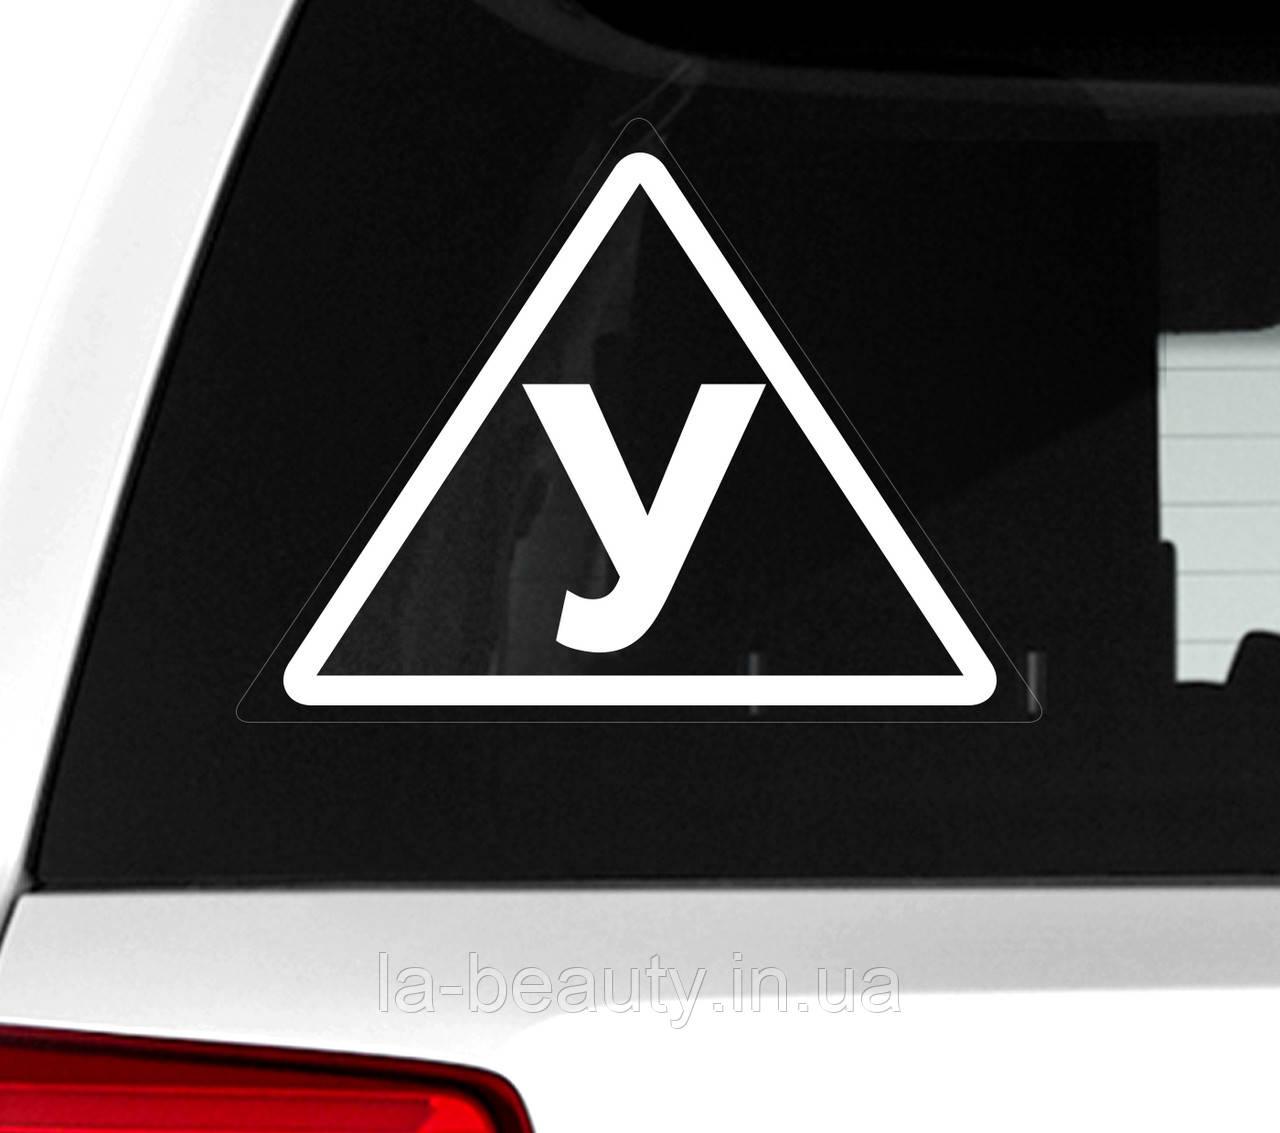 Наклейка знак на машину авто стекло Ученик за рулем